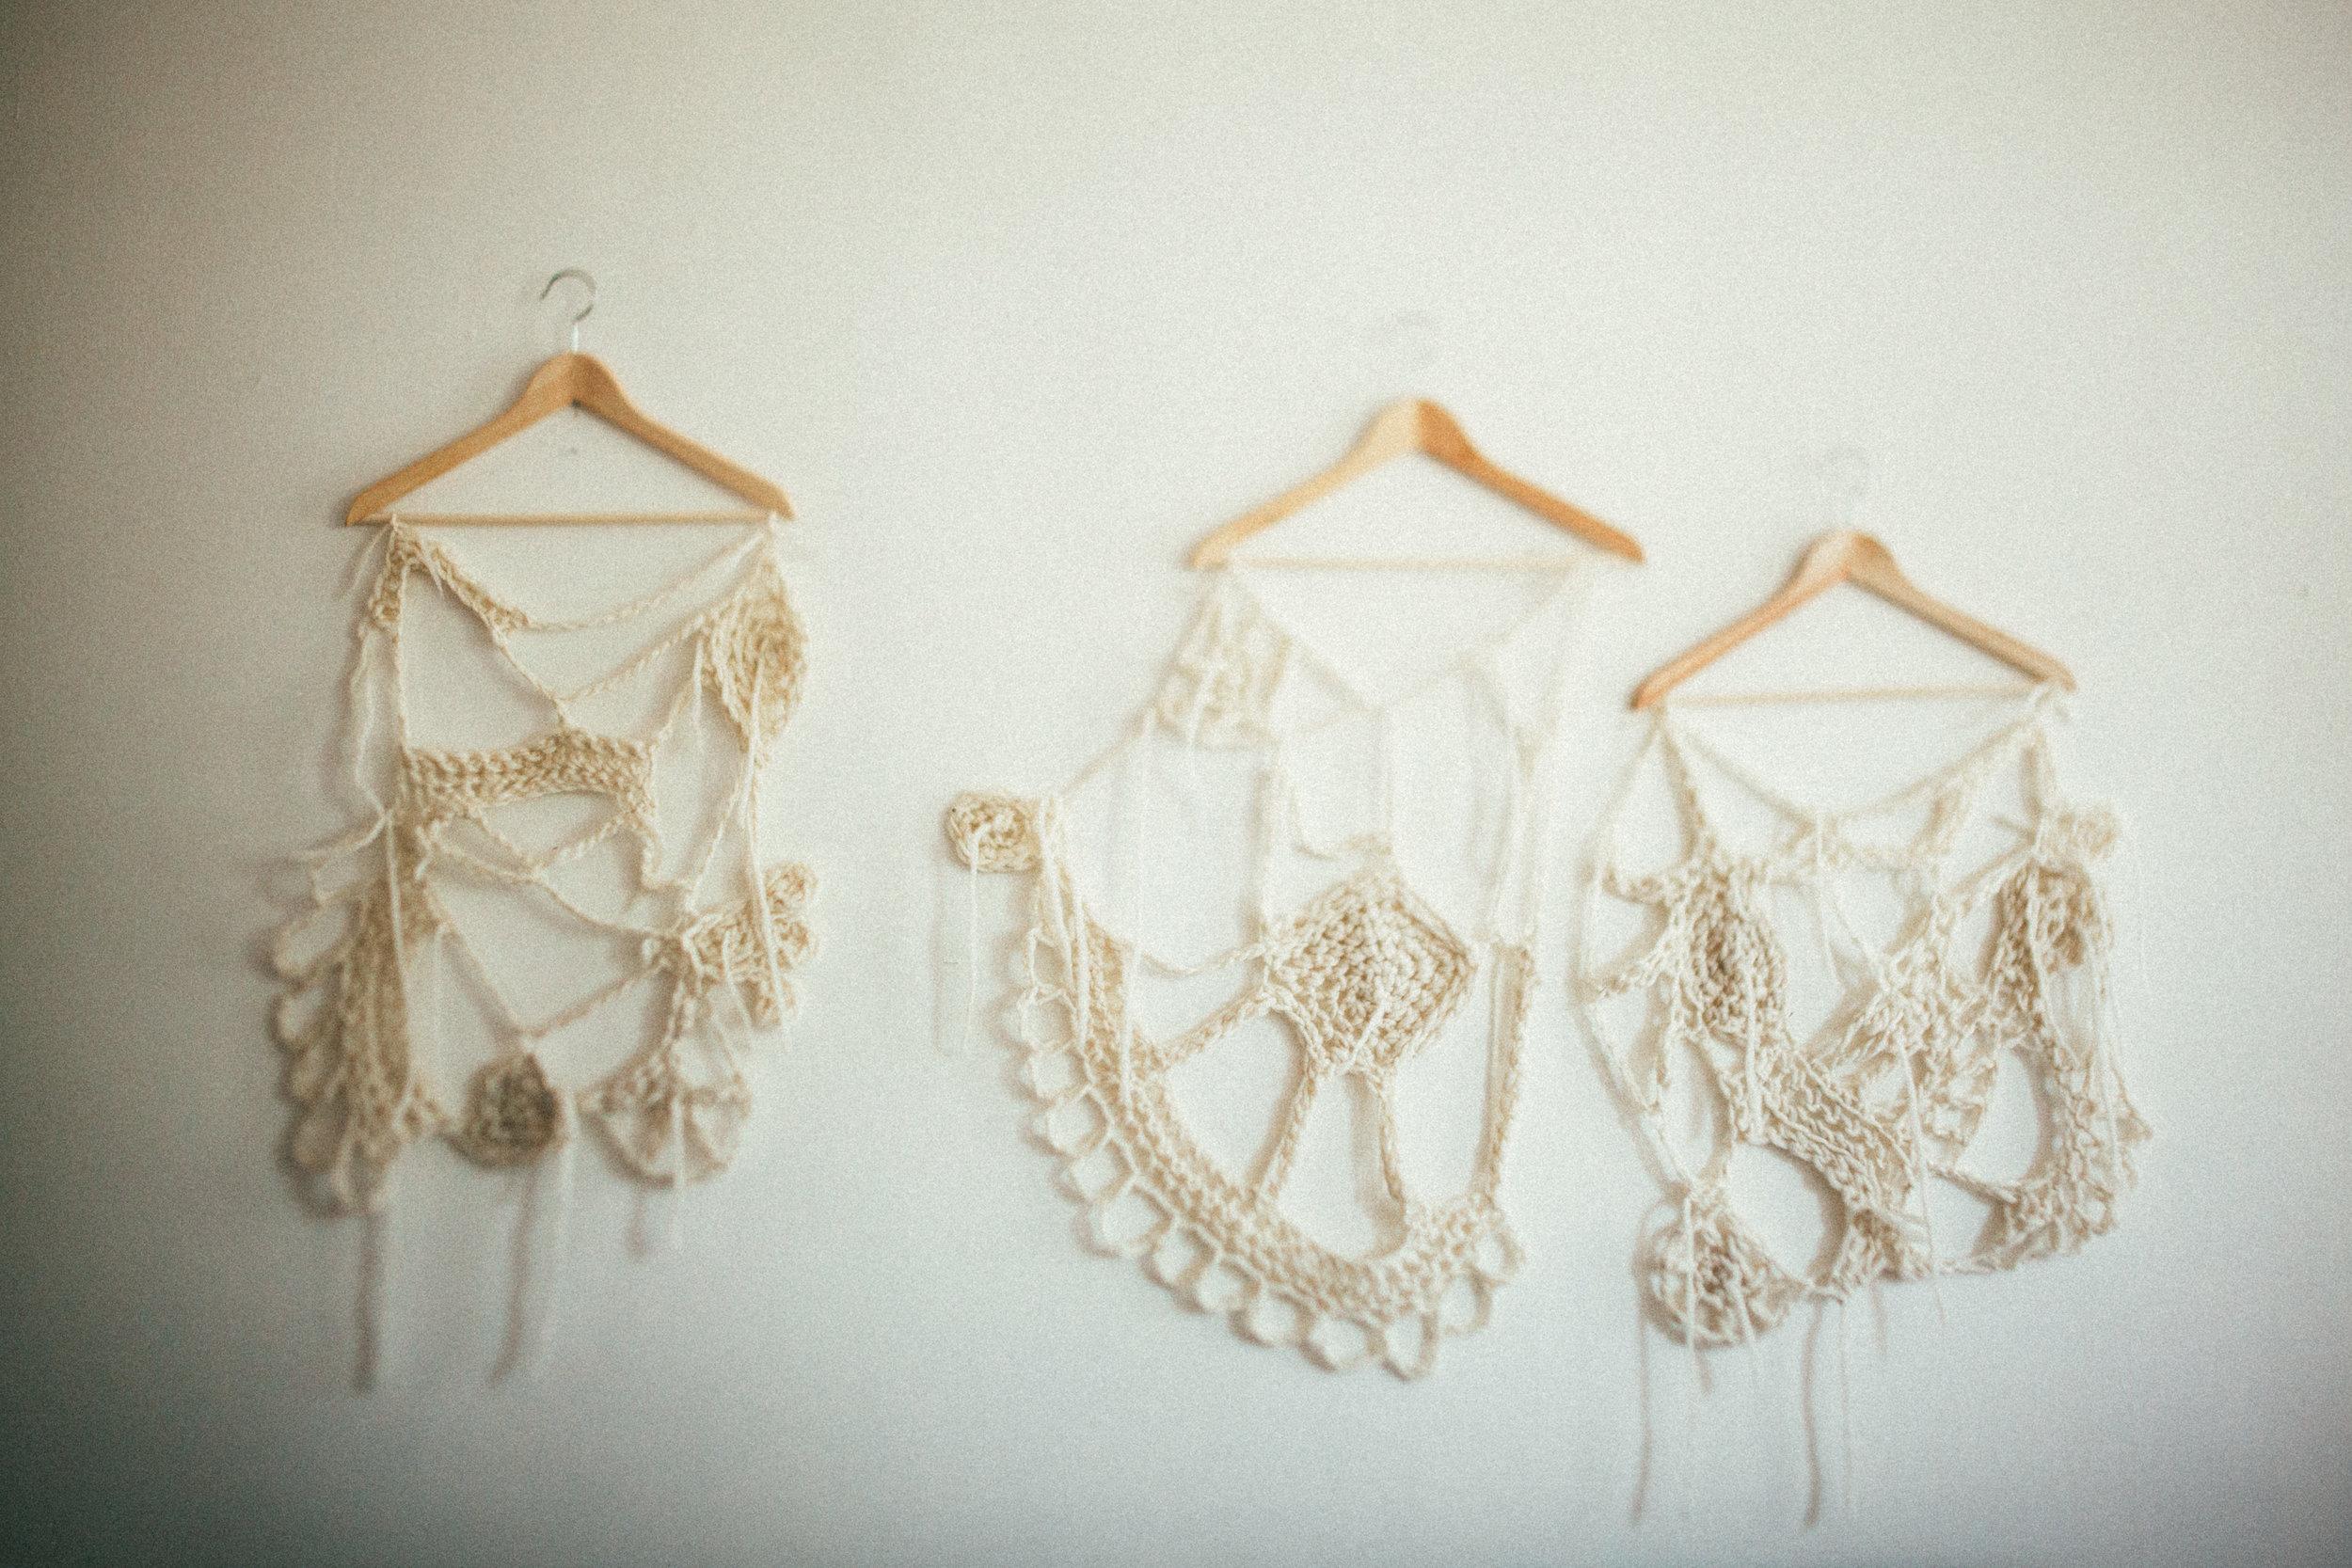 crochet-wall-hangings-8118.jpg